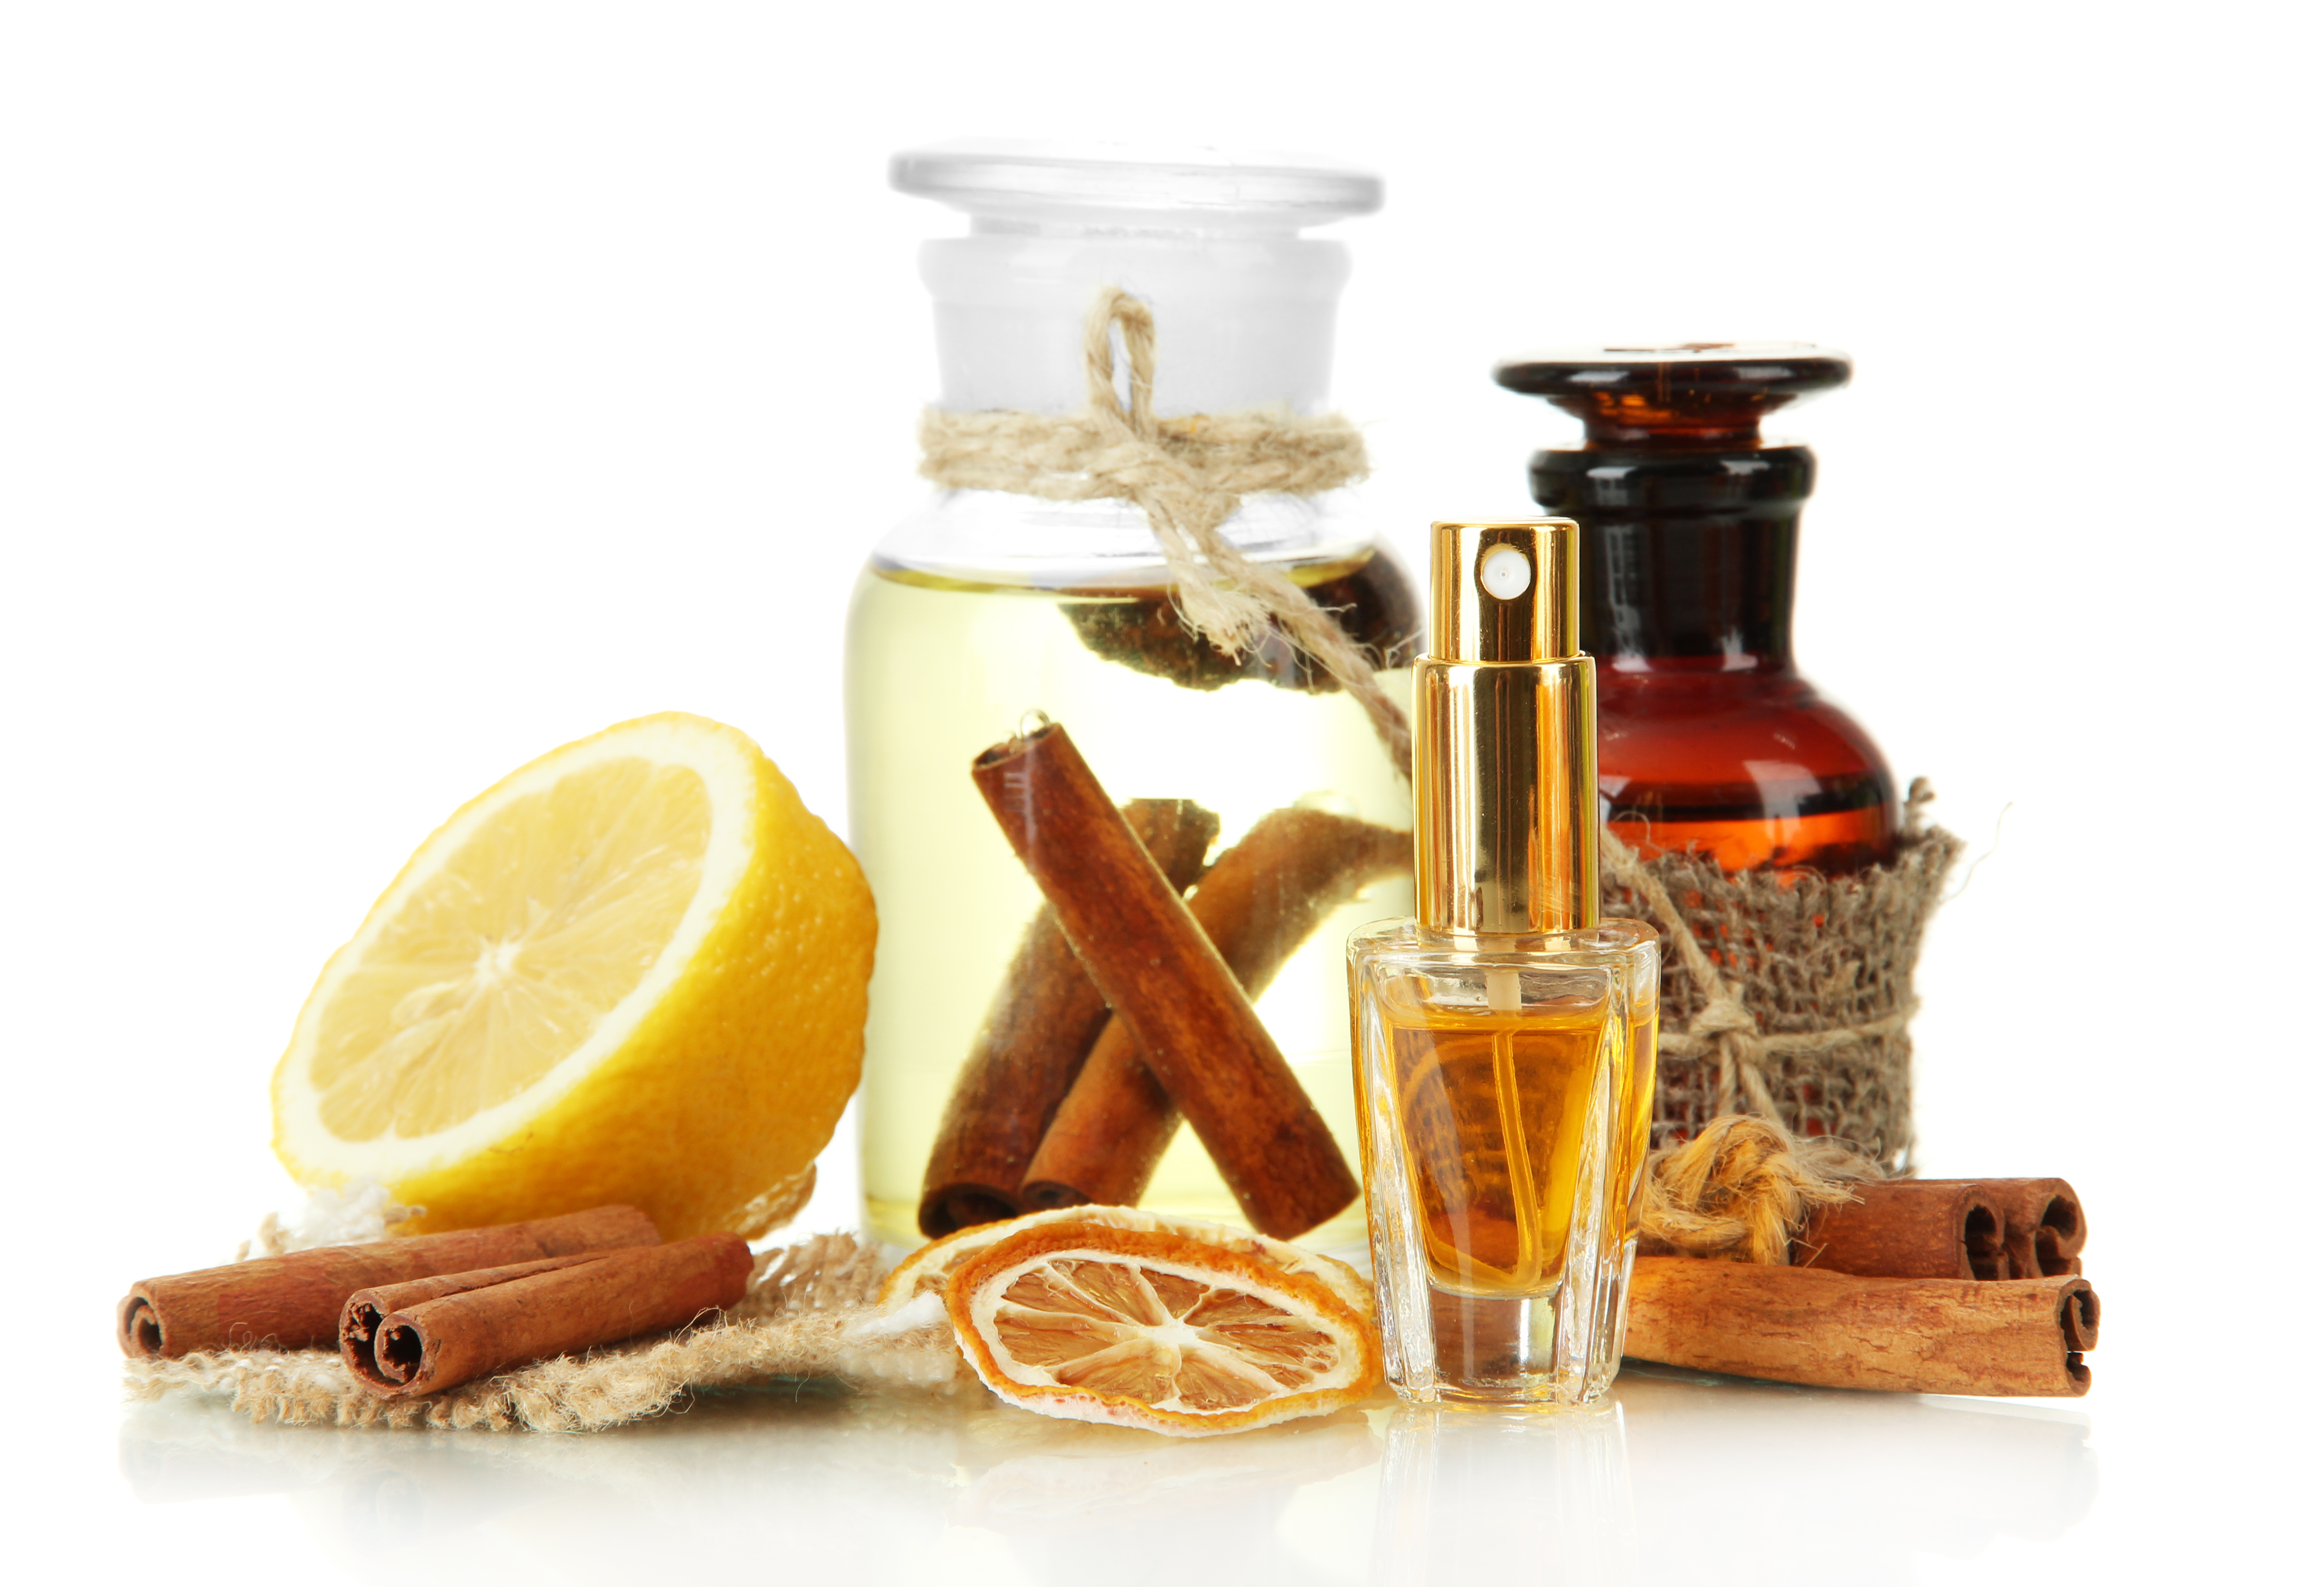 oil cleansing method acne, oil cleansing method blackheads, oil cleansing method purging, oil cleansing method how often